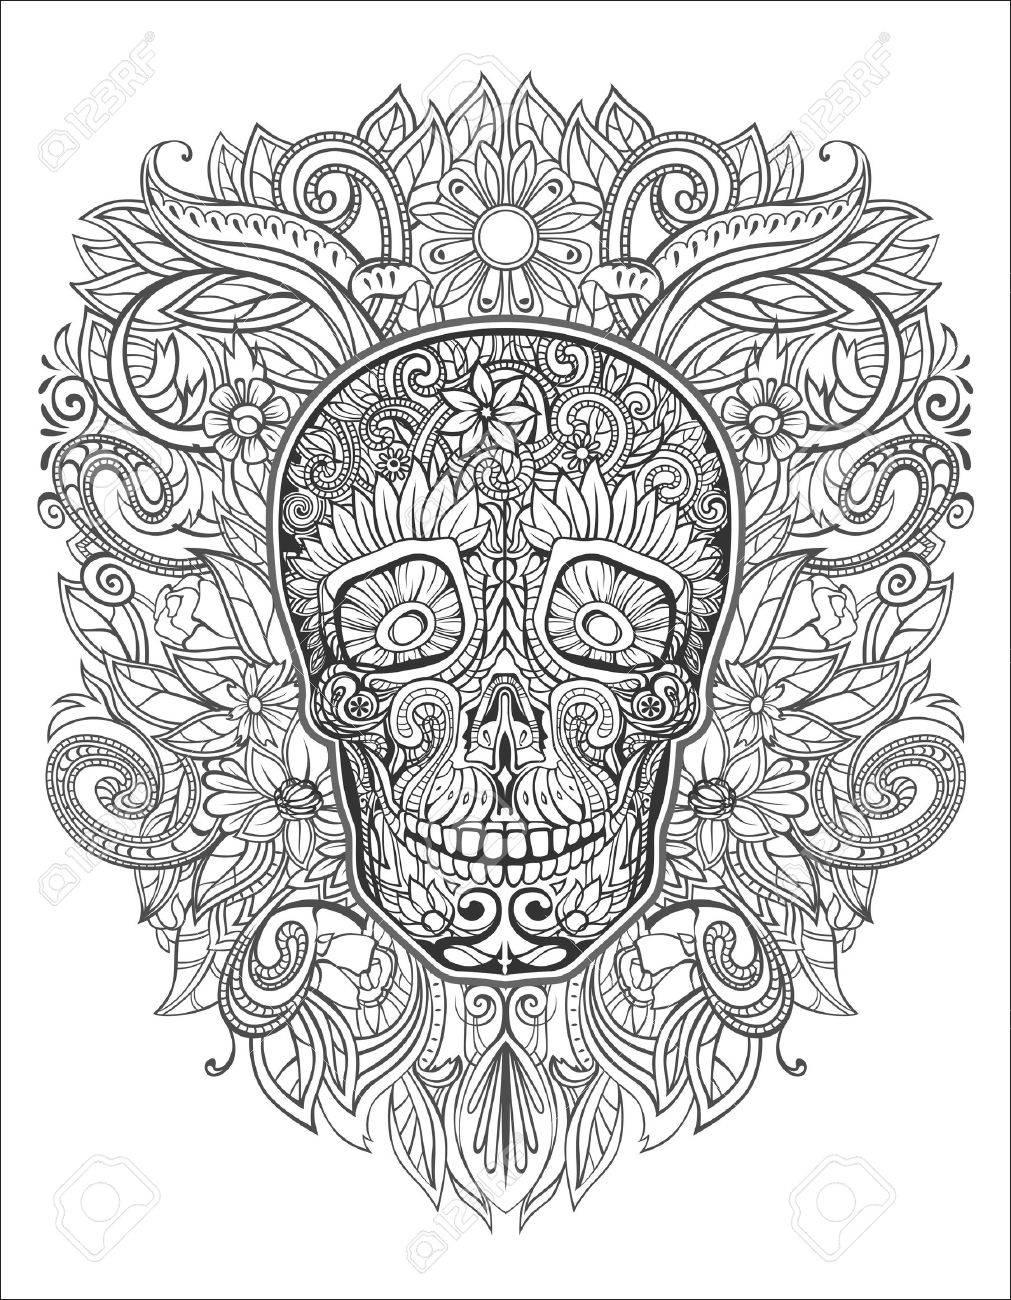 human skull made of flowers, Stock Vector - 37060357